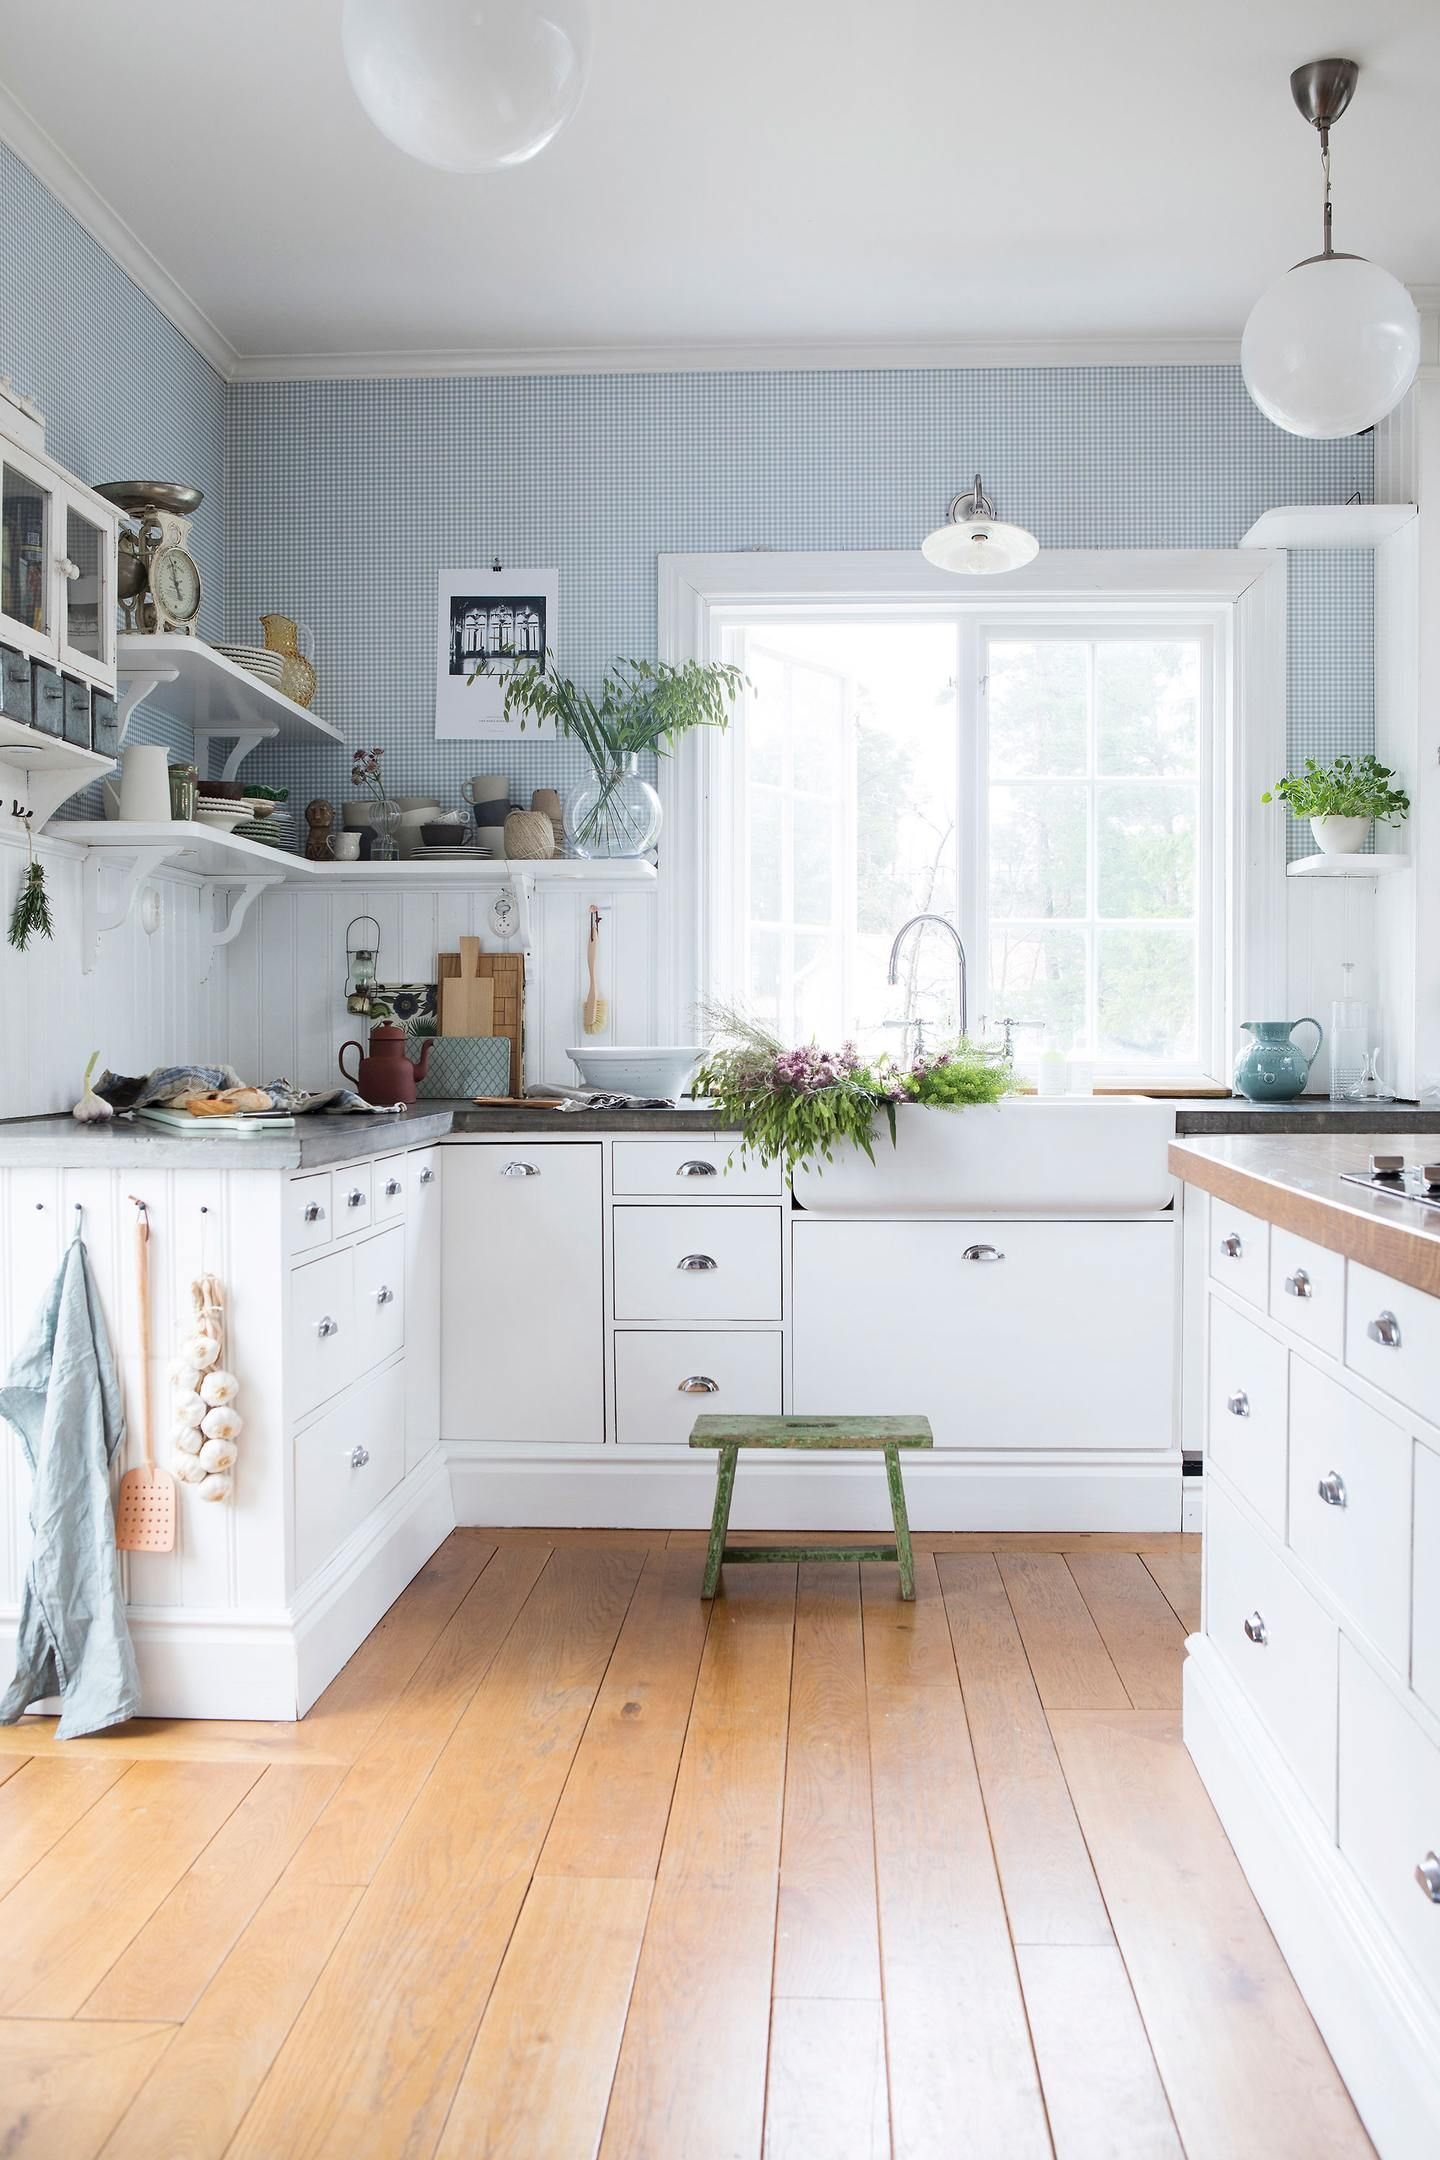 Cucina di Campagna Nordic Style Cucine country, Idee per